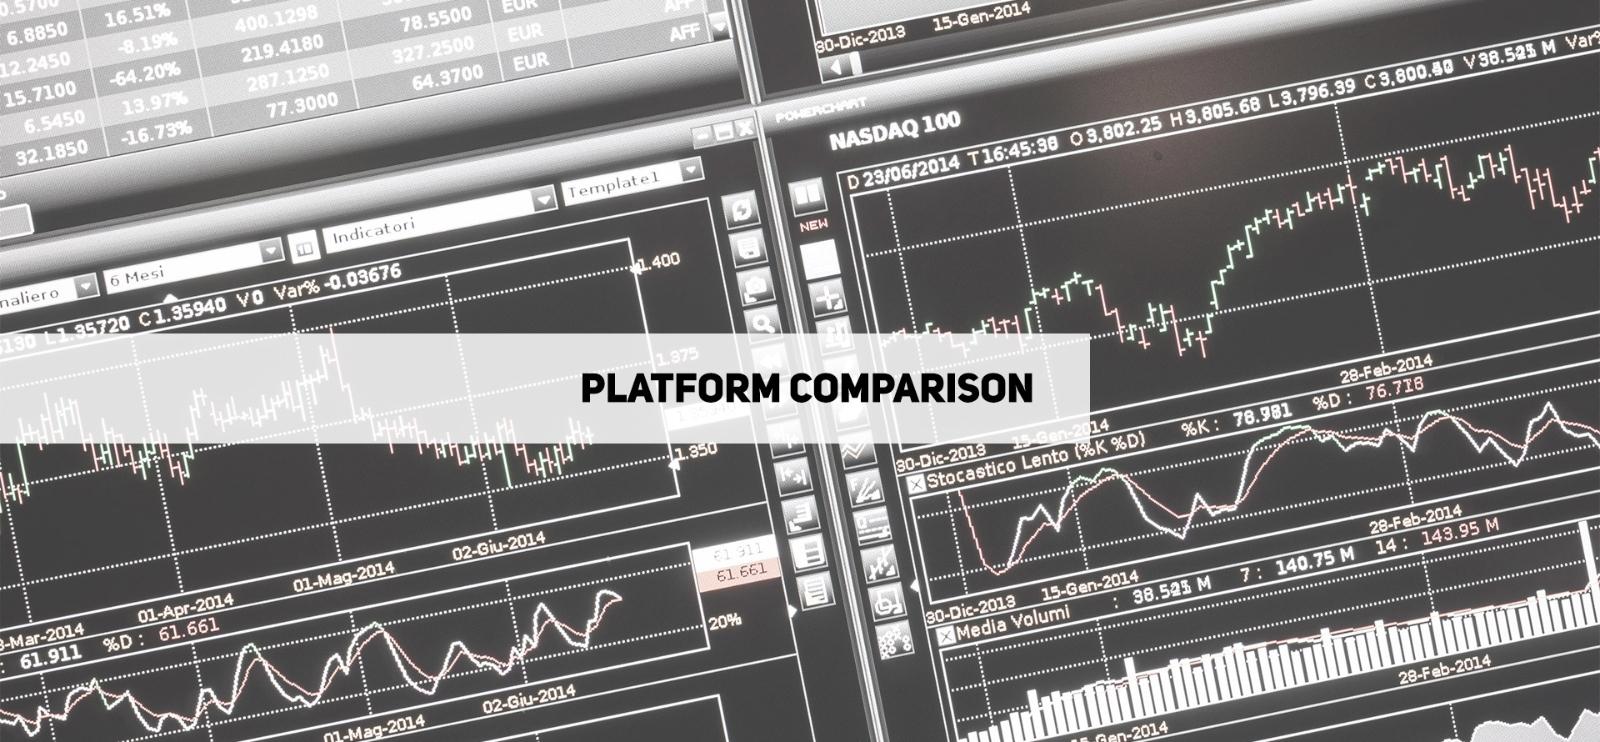 Forex platform comparison